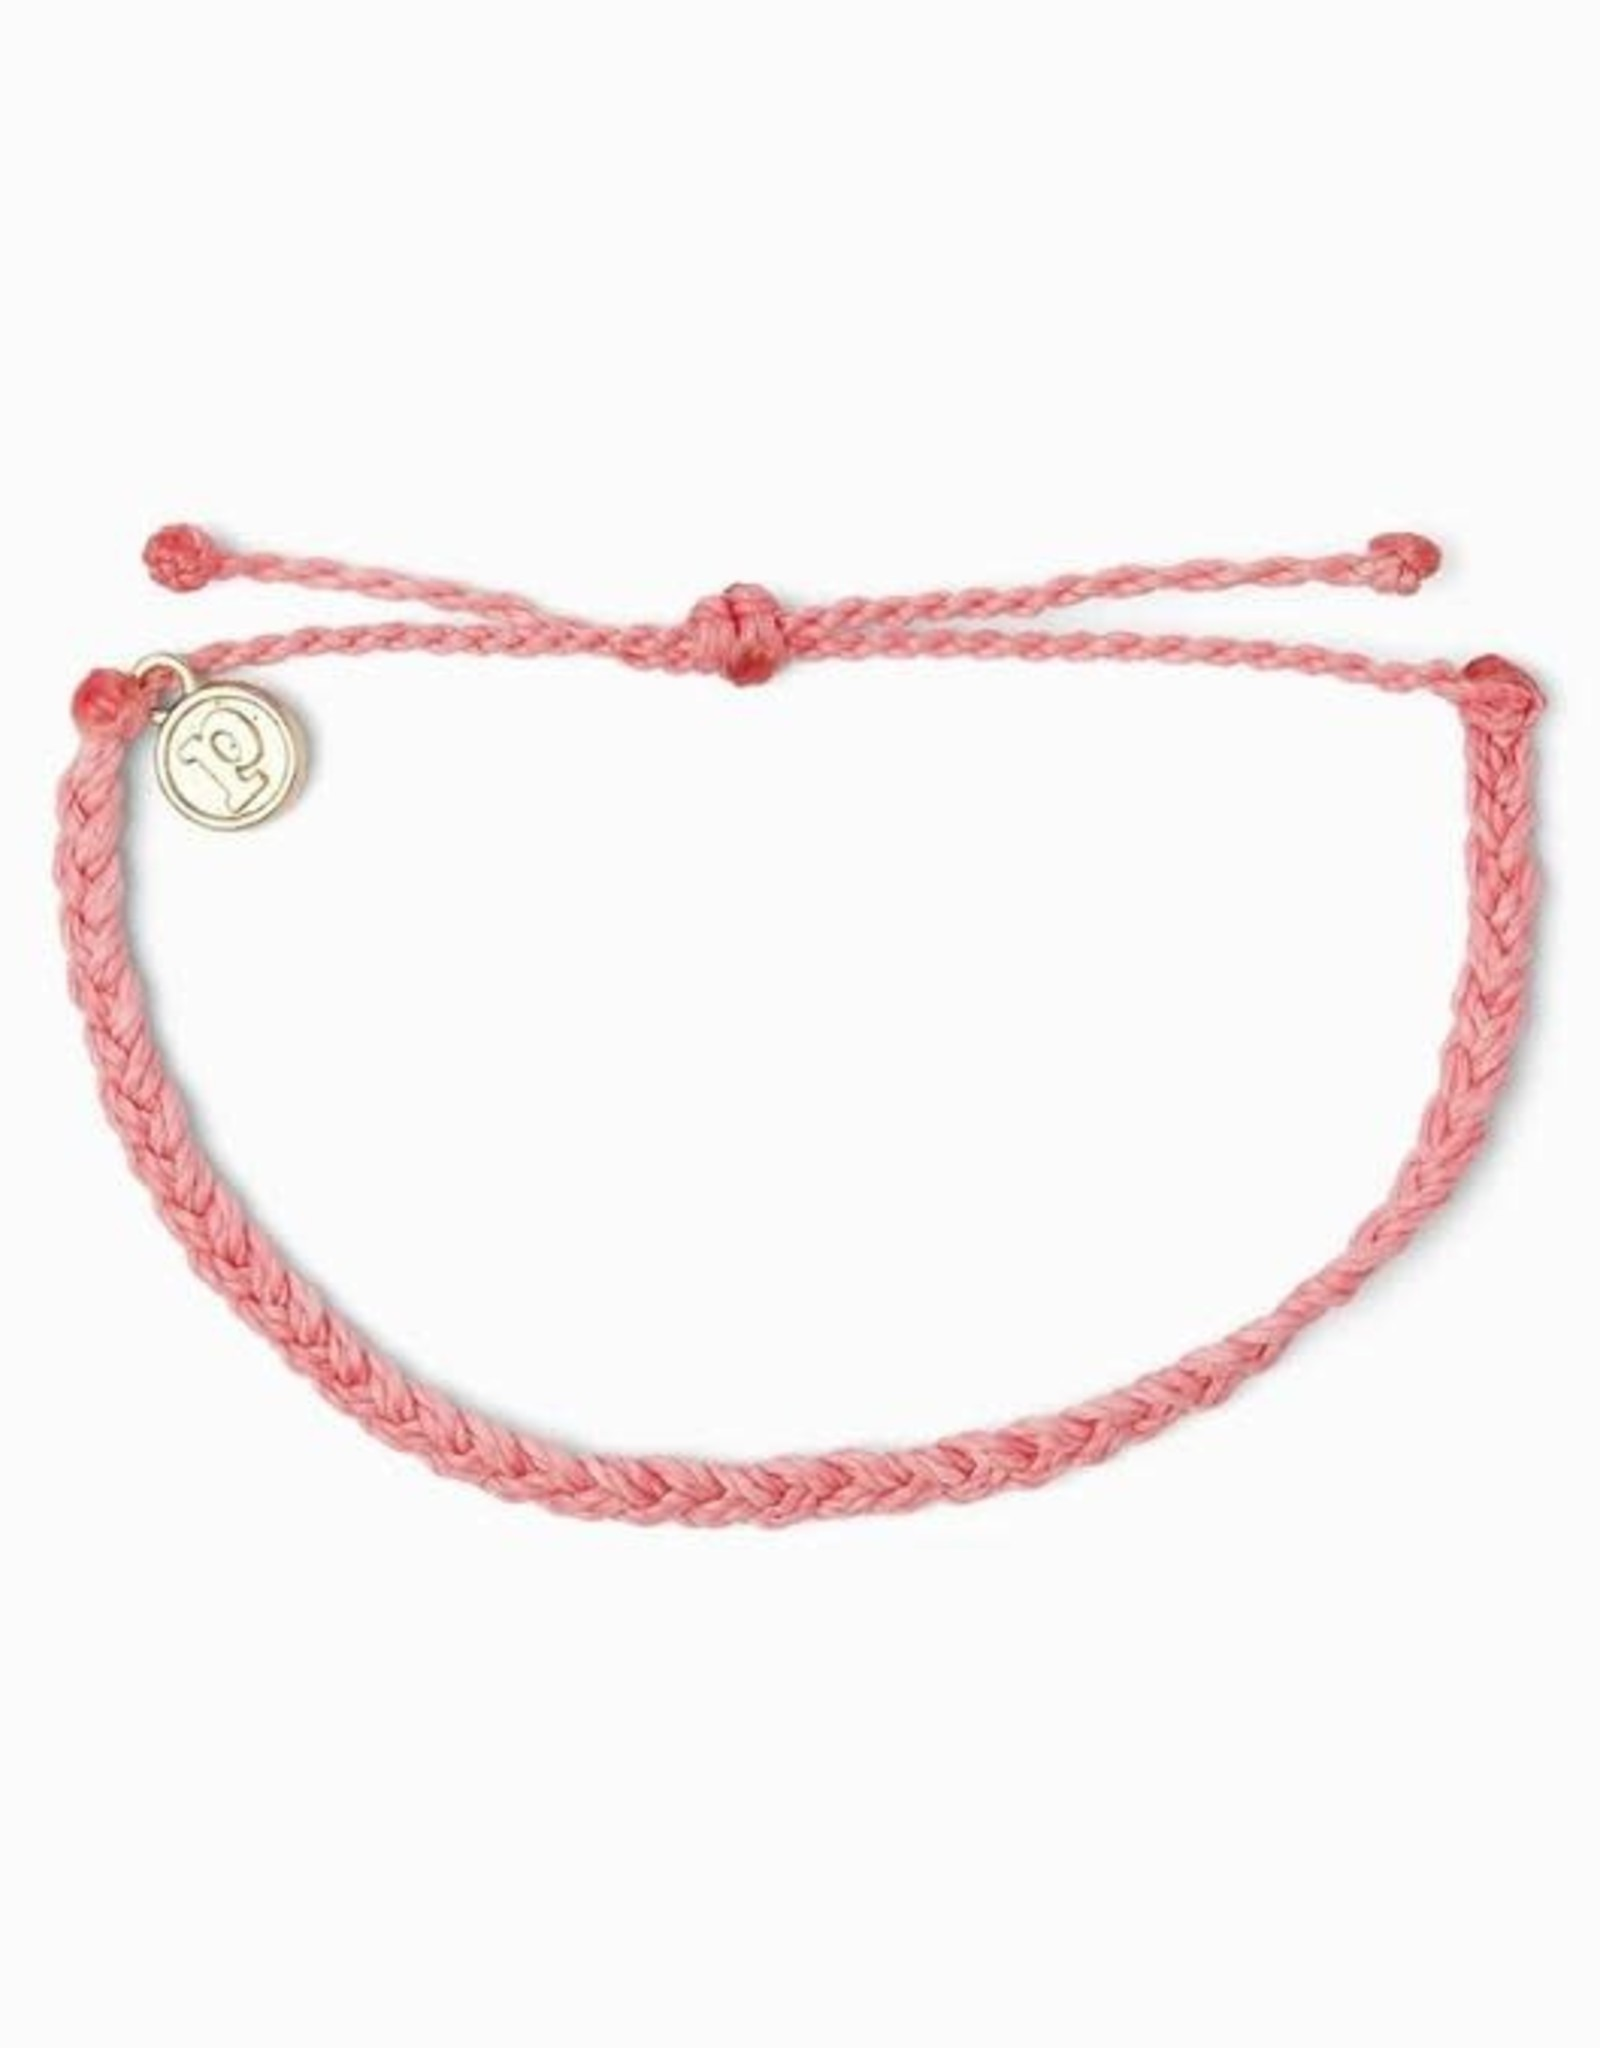 MINI BRAIDED SOLID Bracelet, STRAWBERRY